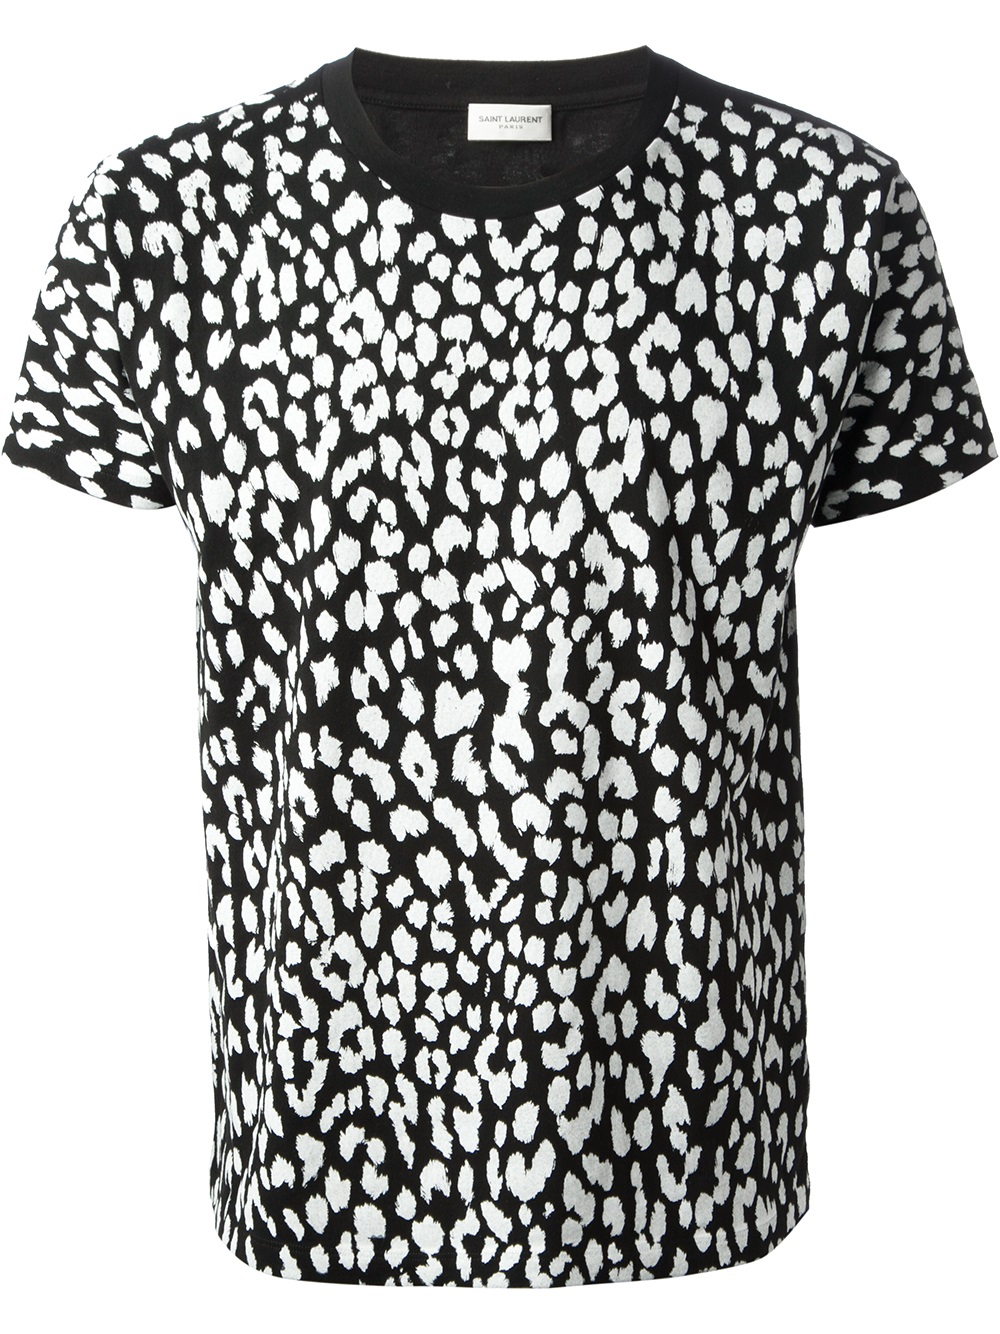 Saint Laurent Leopard Print Tshirt In Black For Men Lyst